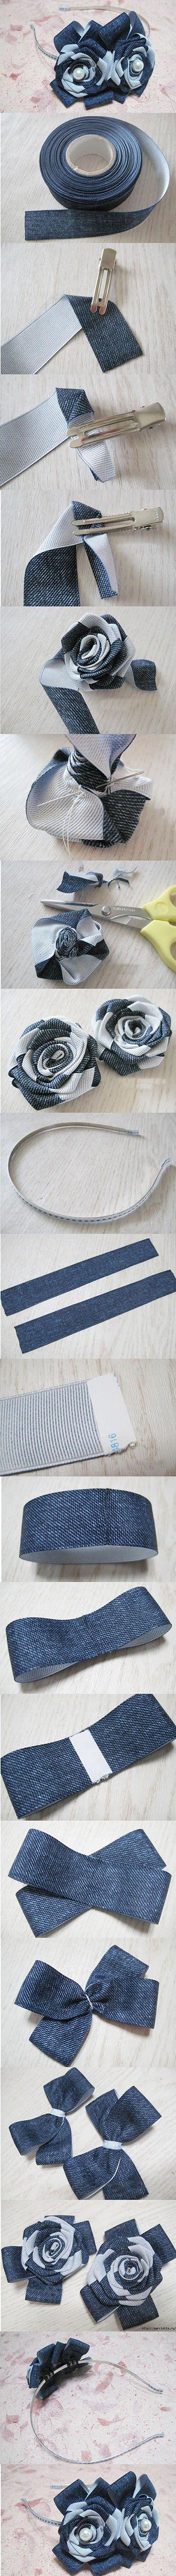 Very Beautiful Jean Craft